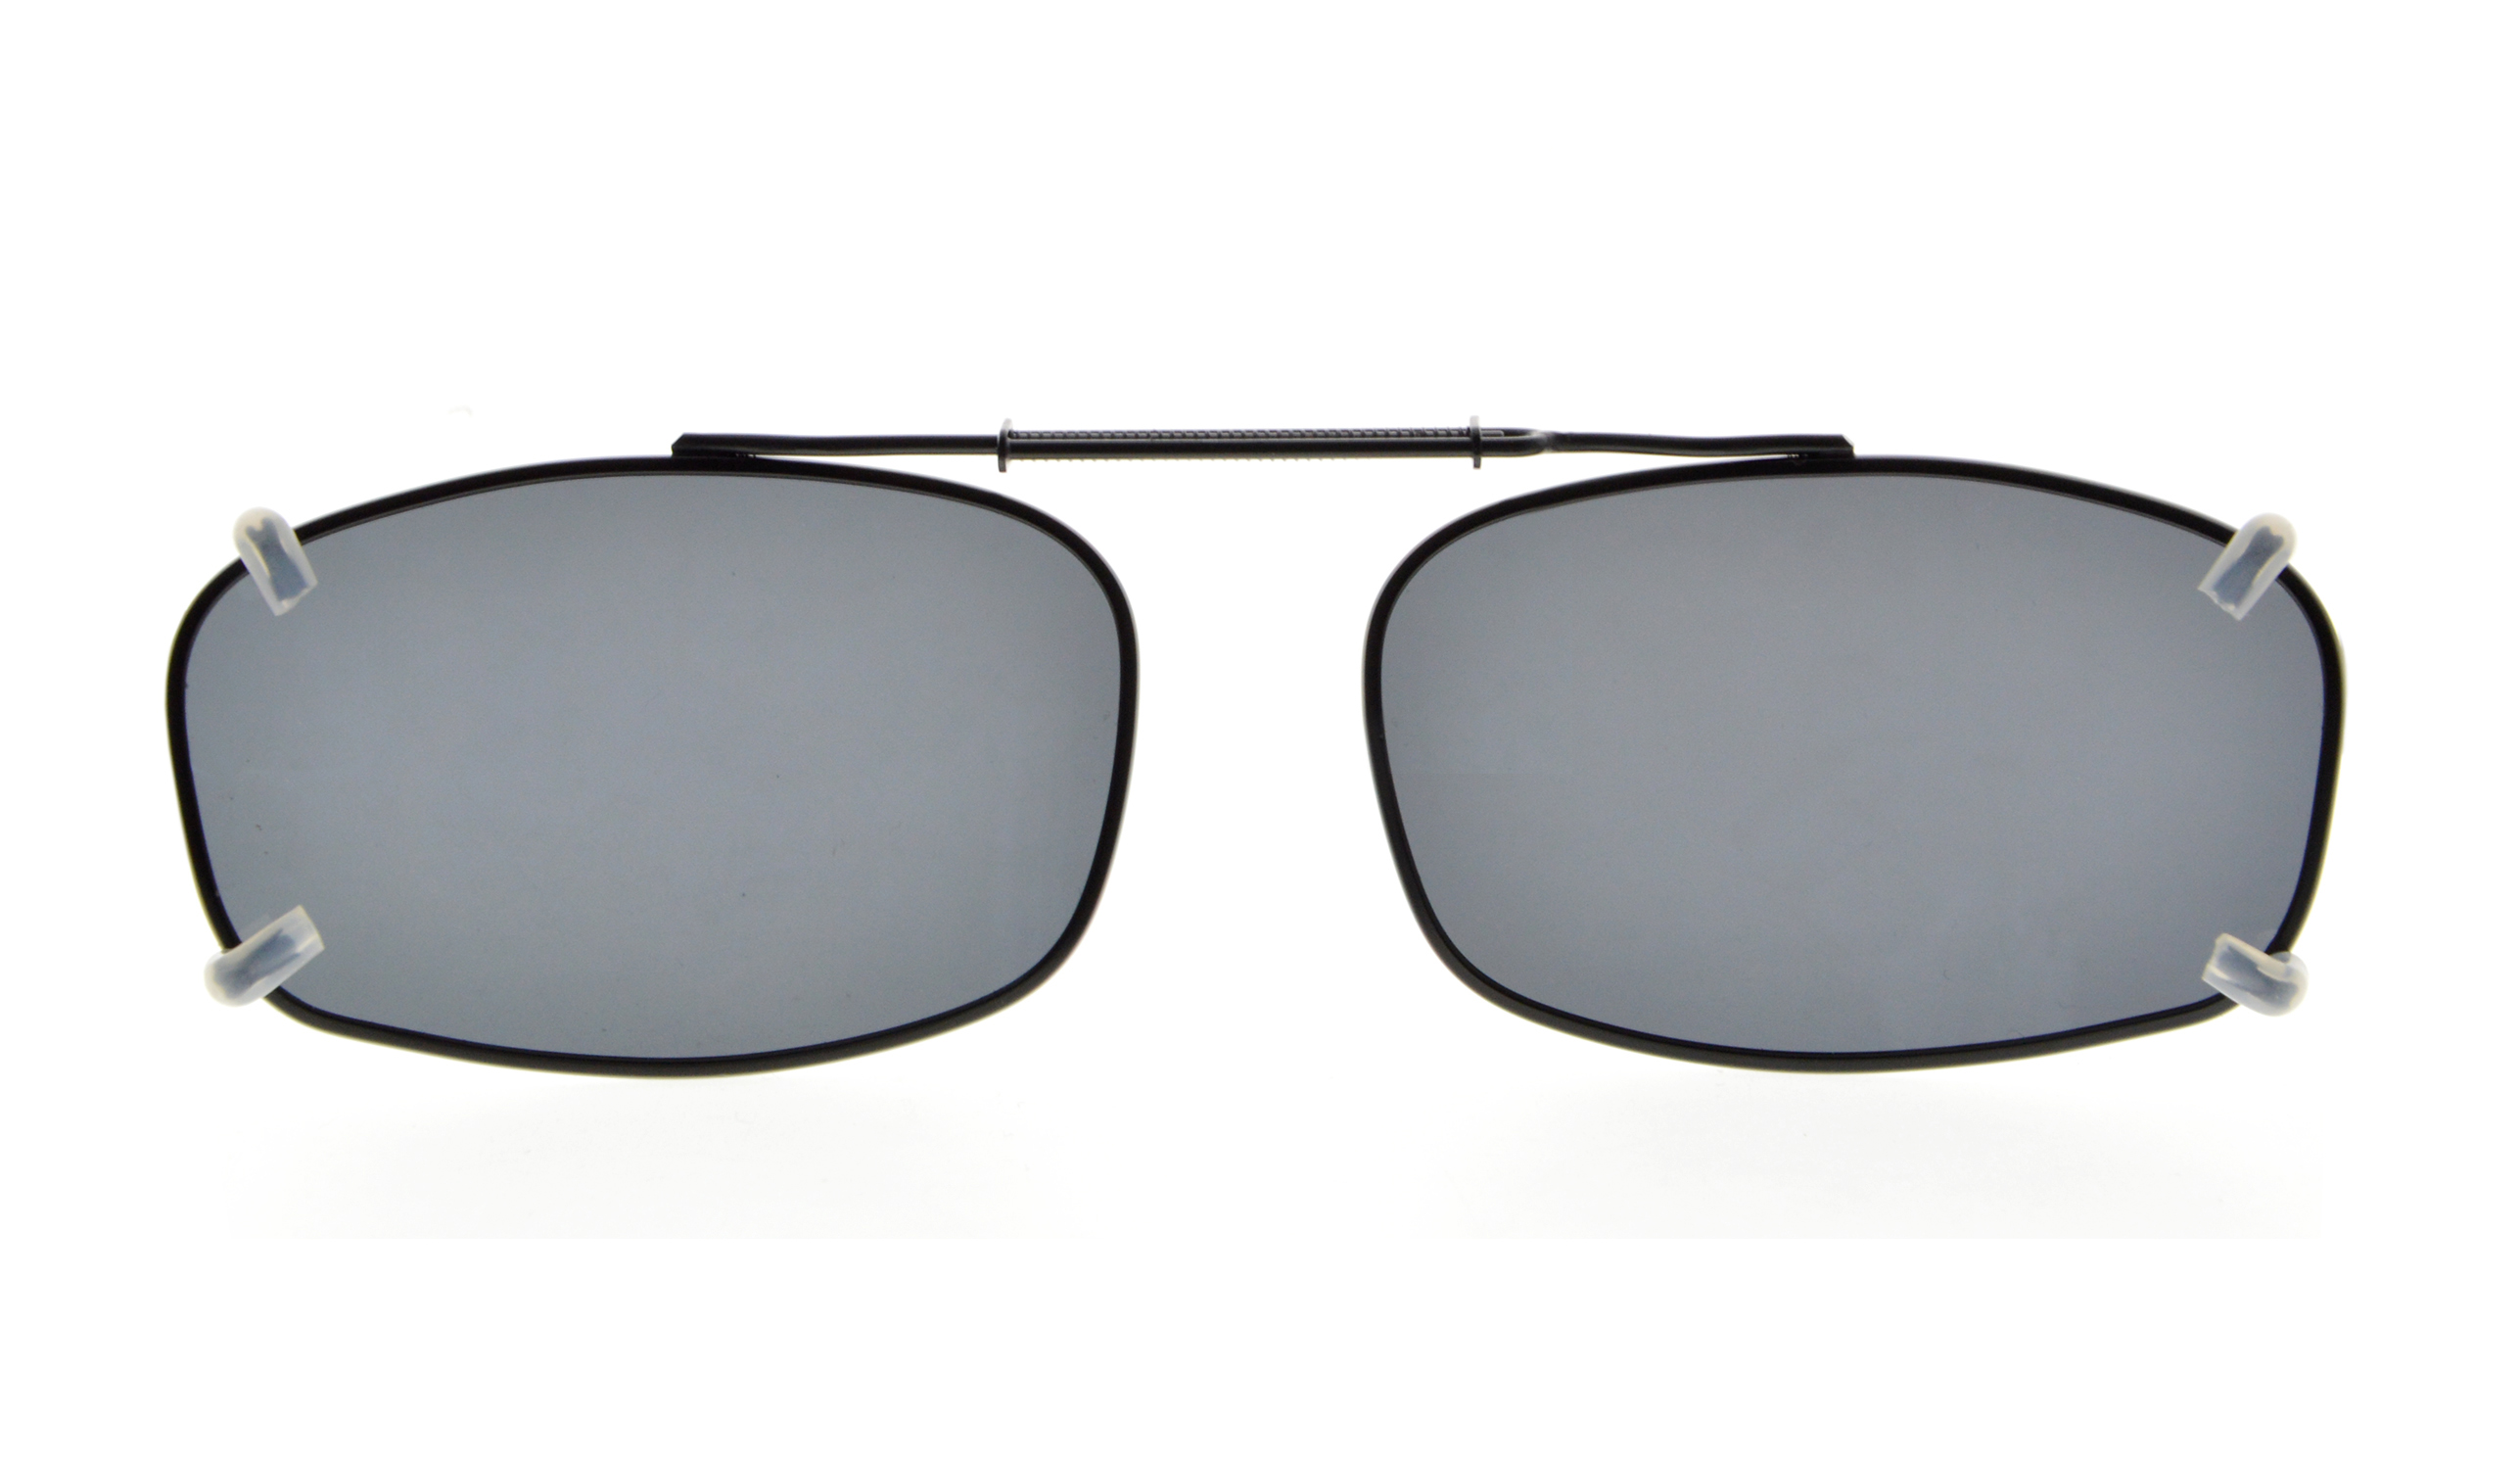 8c19b80d64 Metal Frame Rim Polarized Lens Clip On Sunglasses 2 1 8 x1 5 16 inch  (54×34MM) C65 Item NO  C65